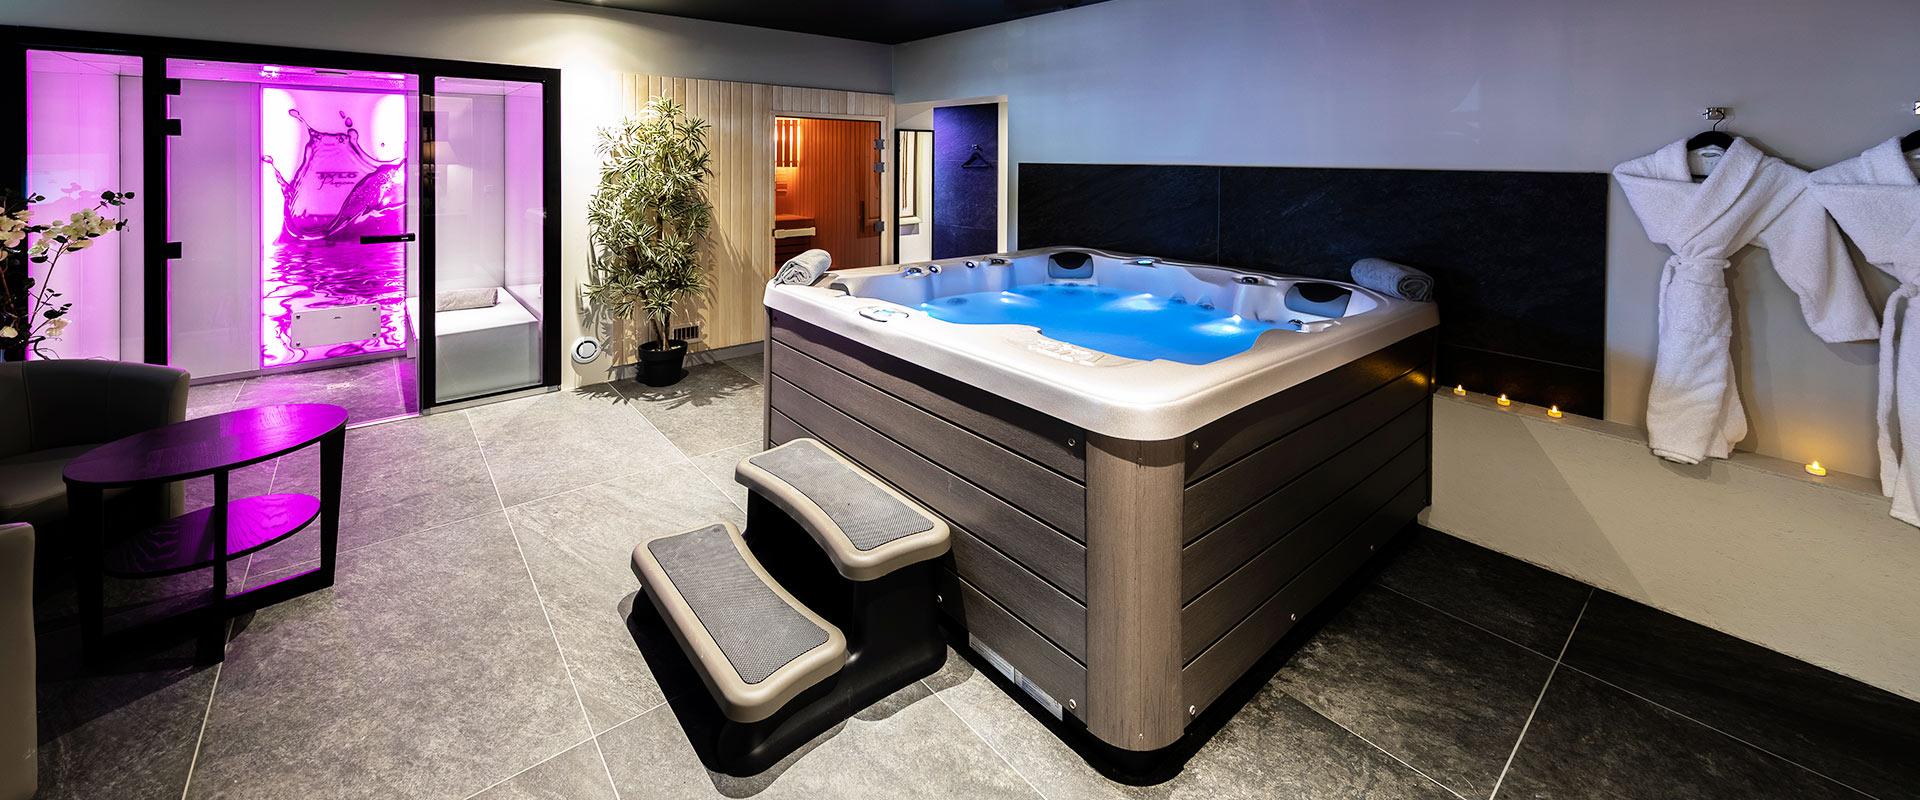 Hotel Avec Spa Bretagne Luxe Hotel Eng